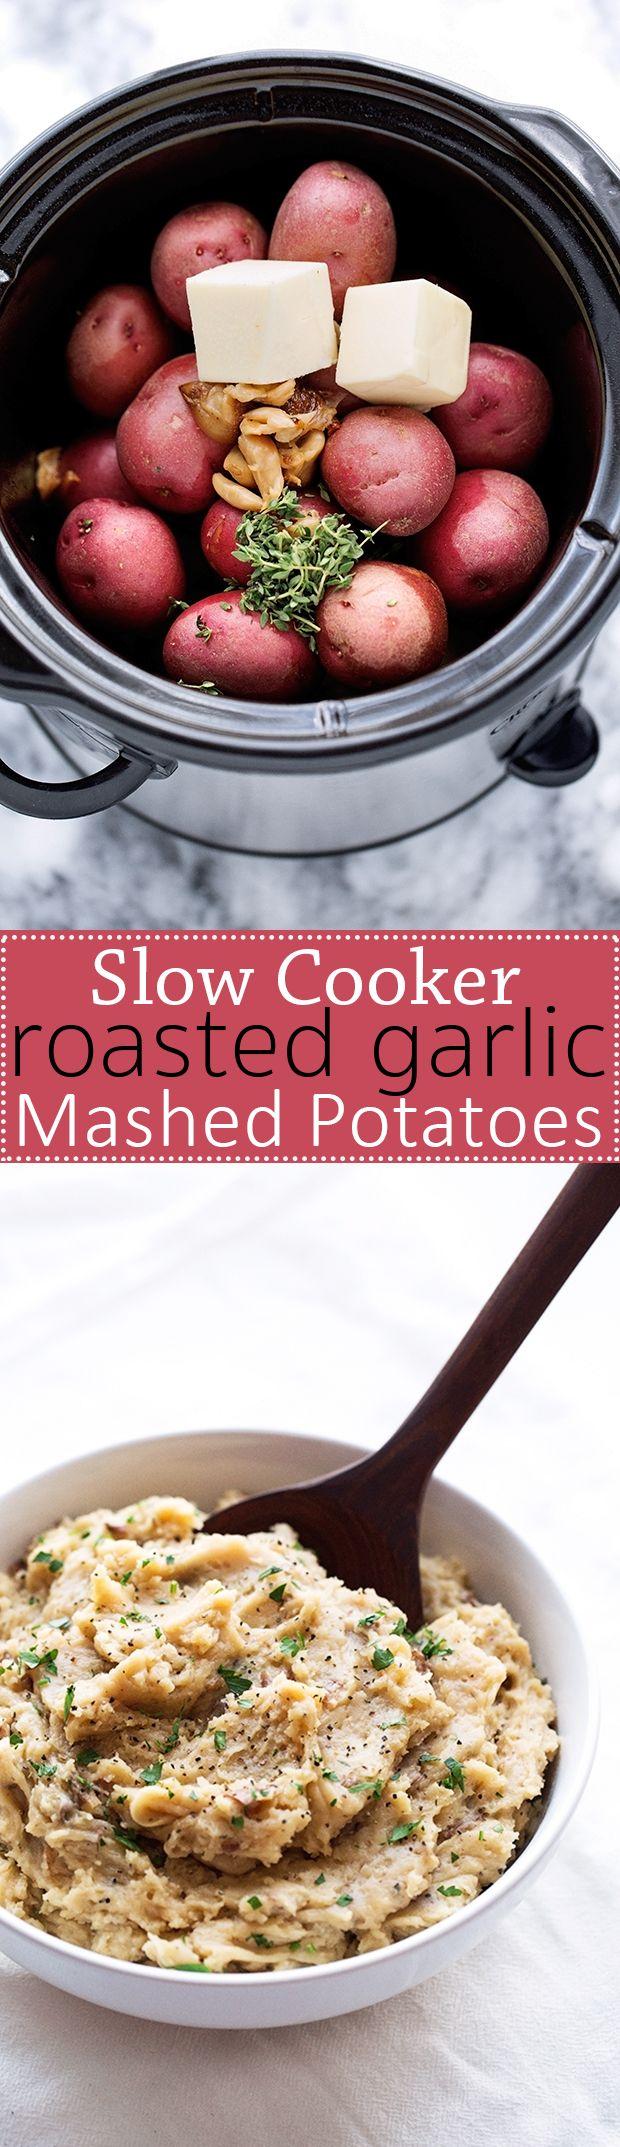 Slow Cooker Roasted Garlic Mashed Potatoes Recipe | Pinterest ...